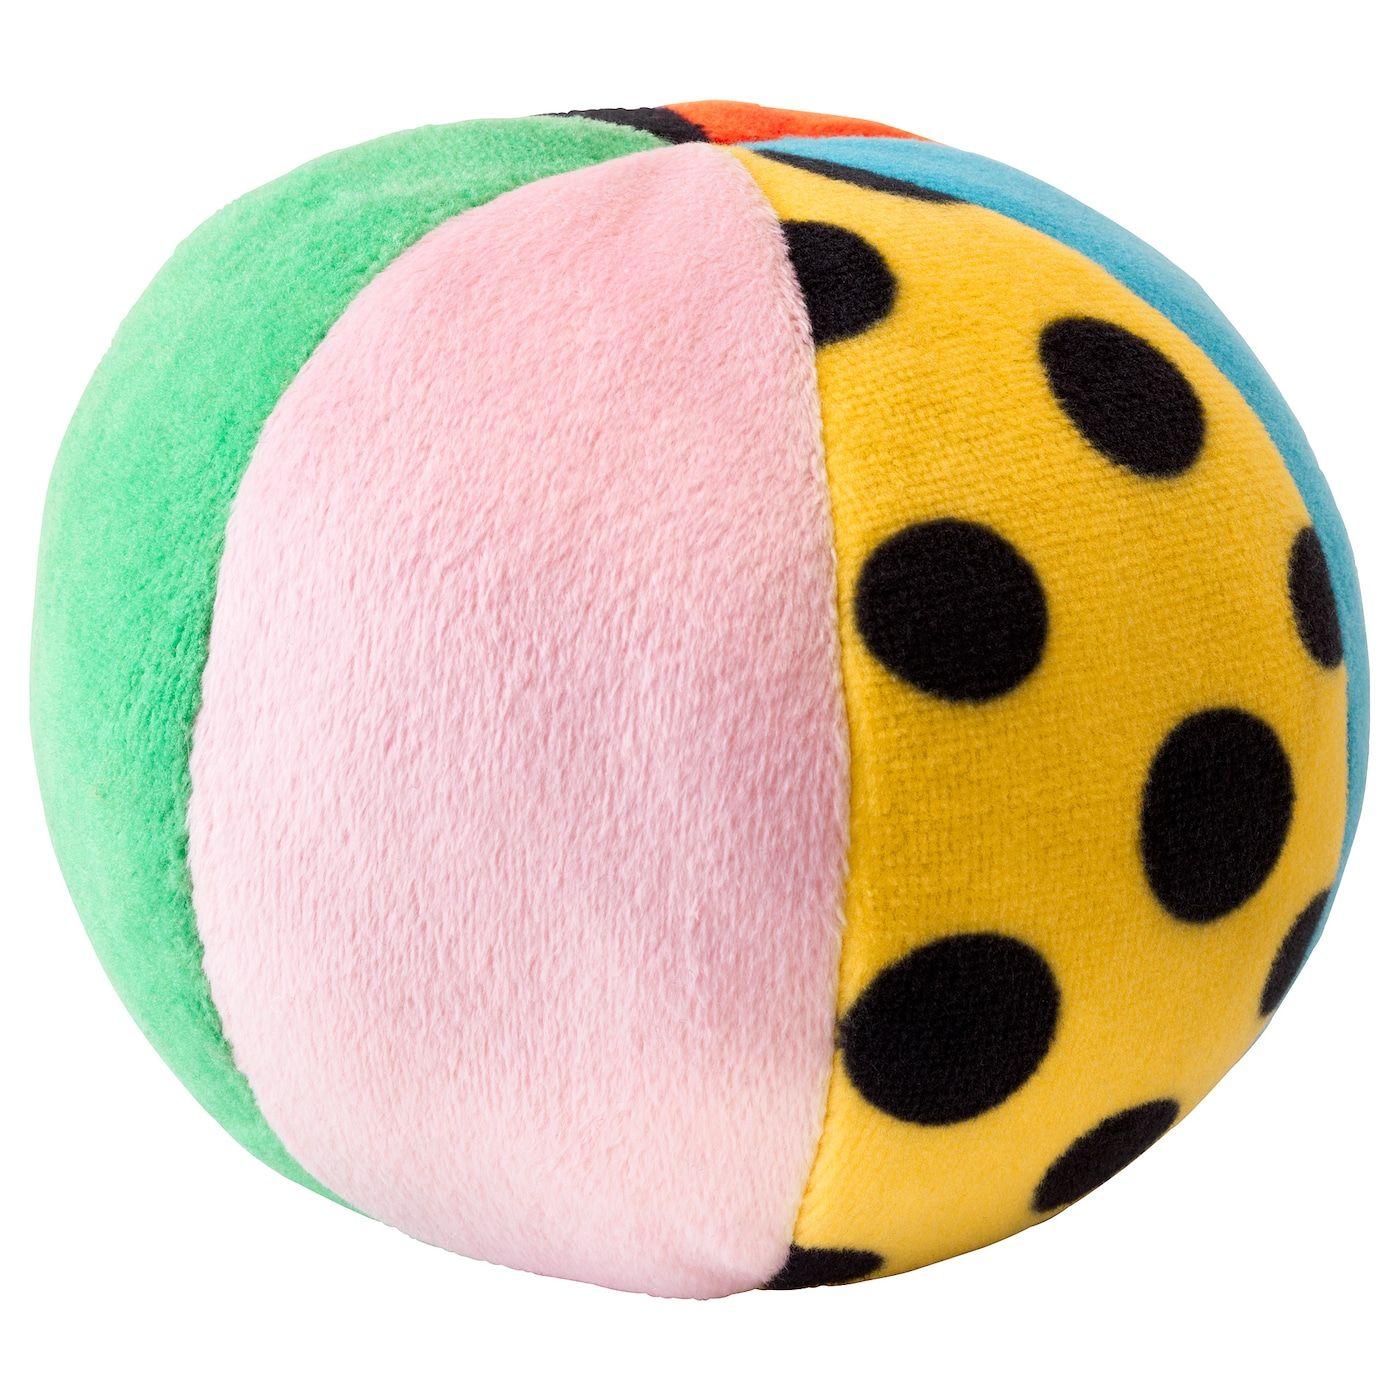 Klappa Stoffspielzeug Ball Bunt Ikea Osterreich In 2020 Soft Toy Ikea Baby Toys